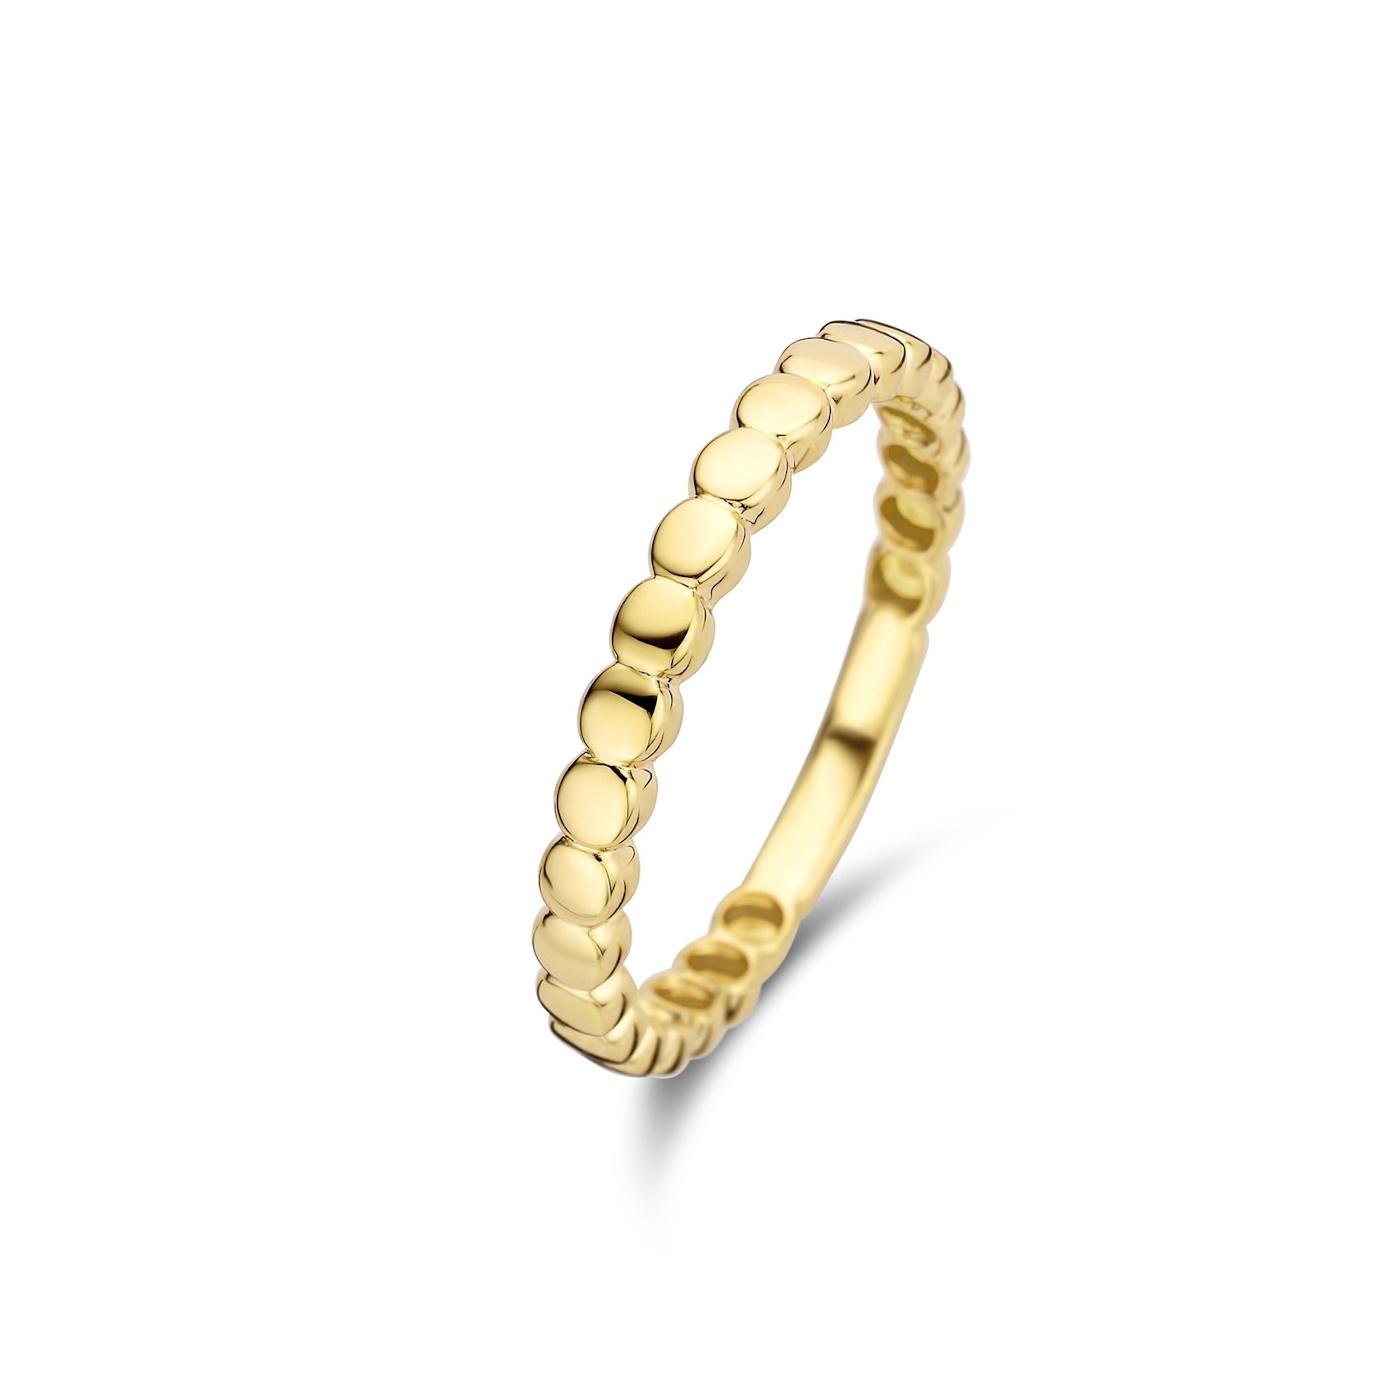 Isabel Bernard Le Marais Zélie 14 karat gold ring with circles